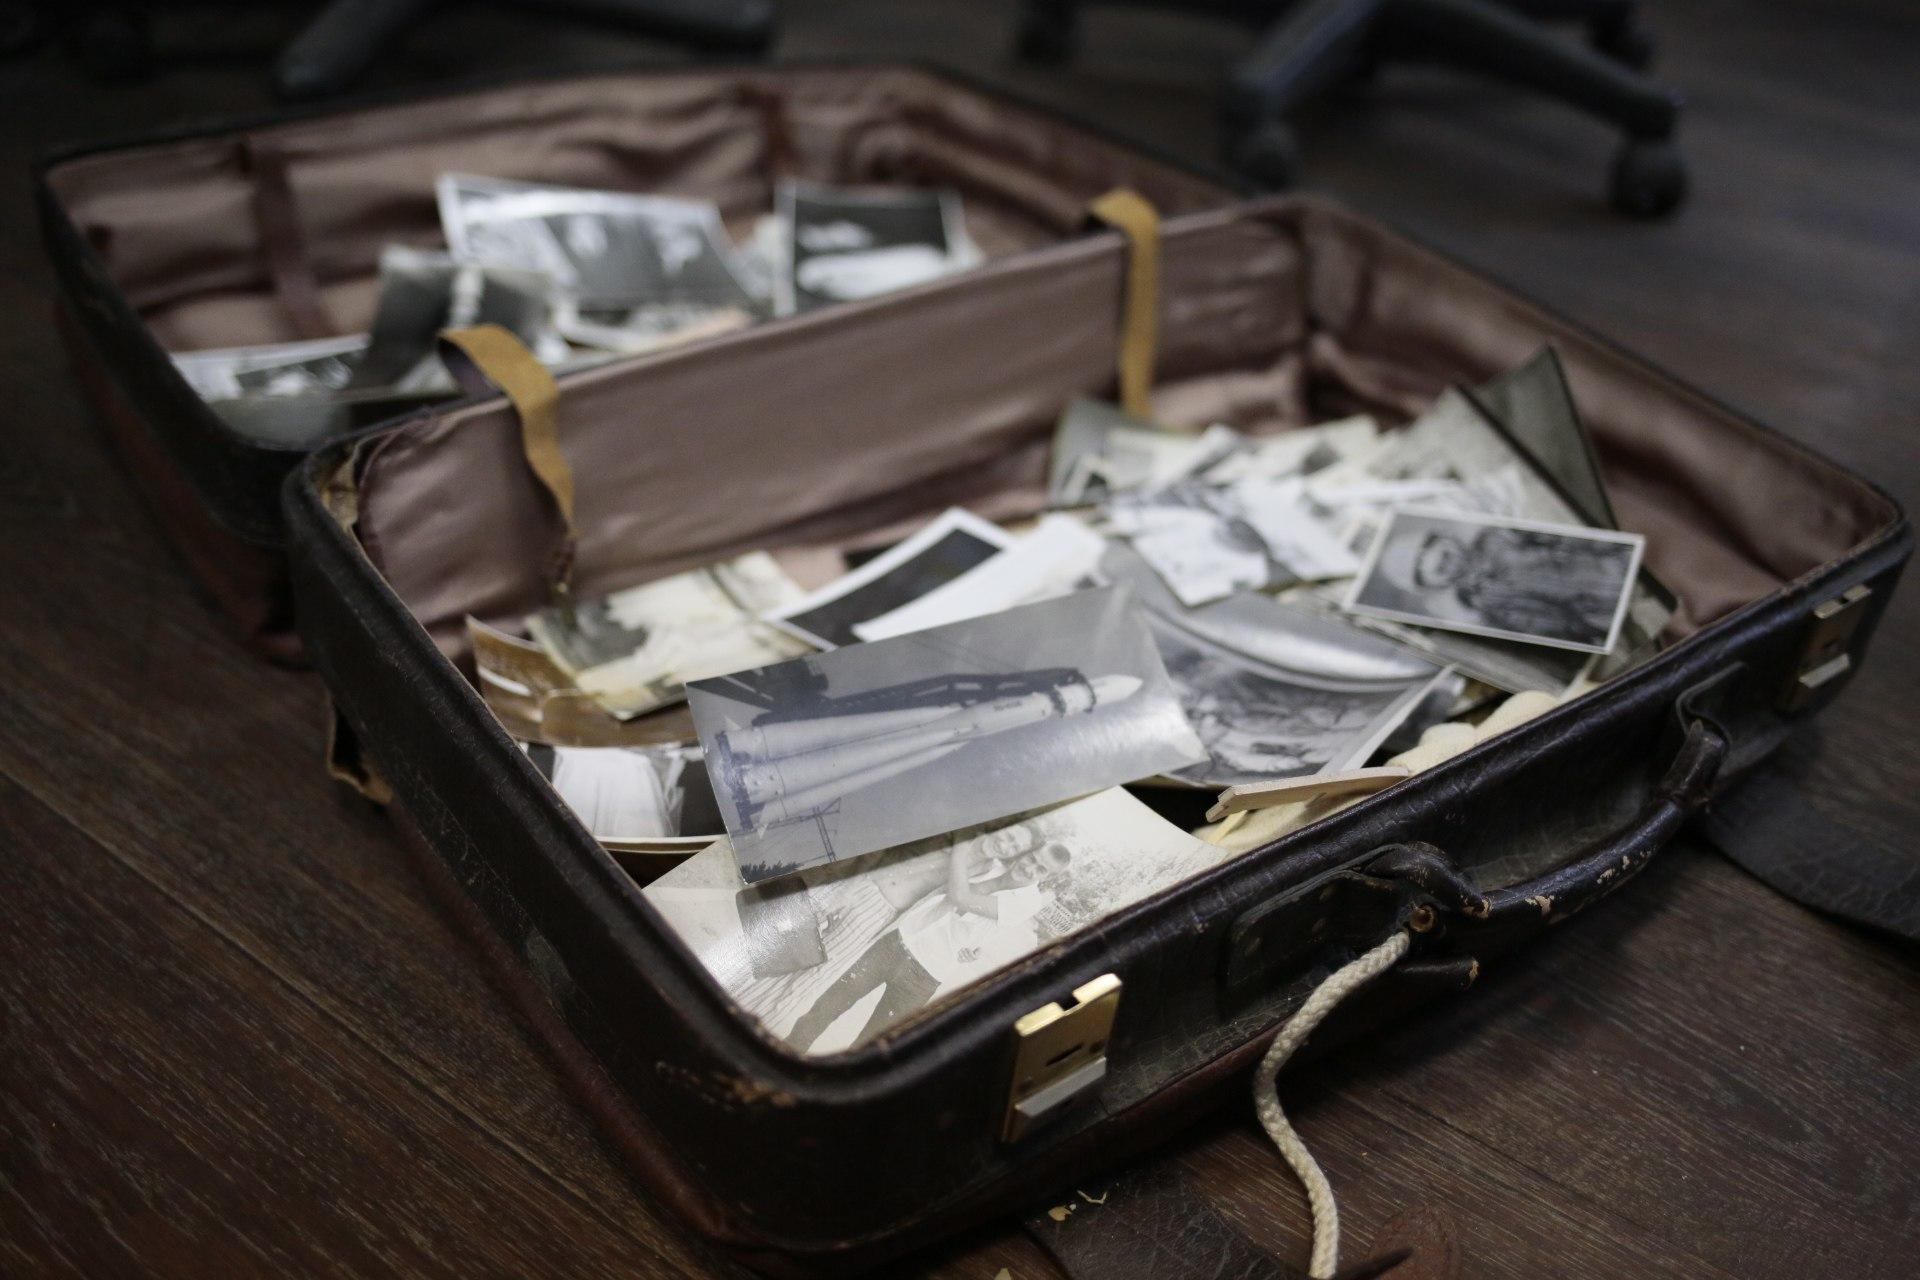 eJ5uGtFe8_M чемодан борис чекунов